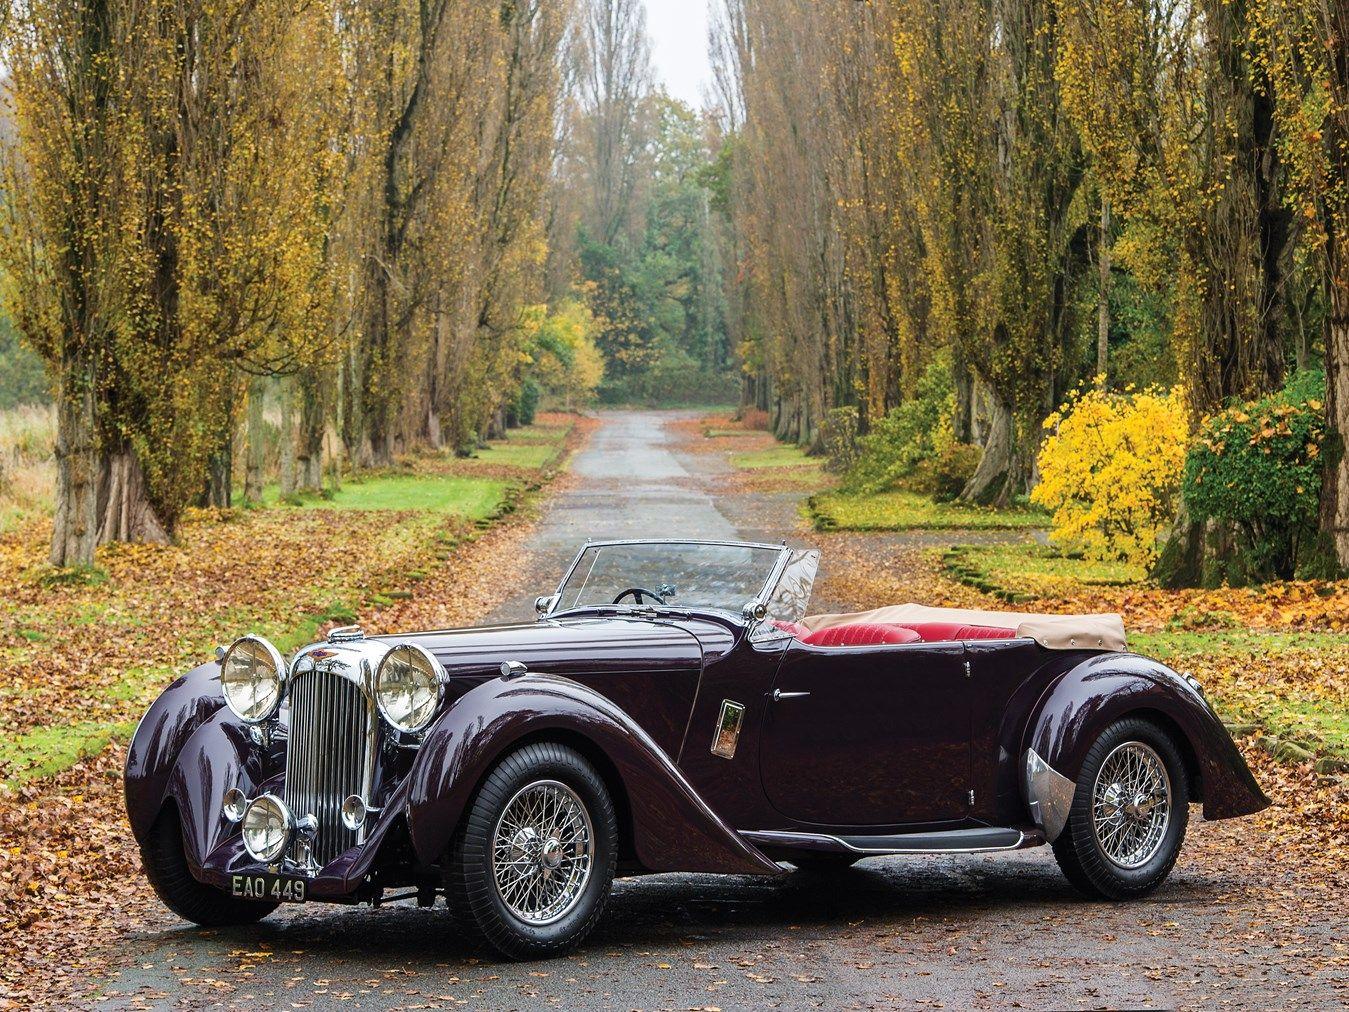 1937 Lagonda LG6 Rapide Tourer | Classy cars, Vintage cars, Cars